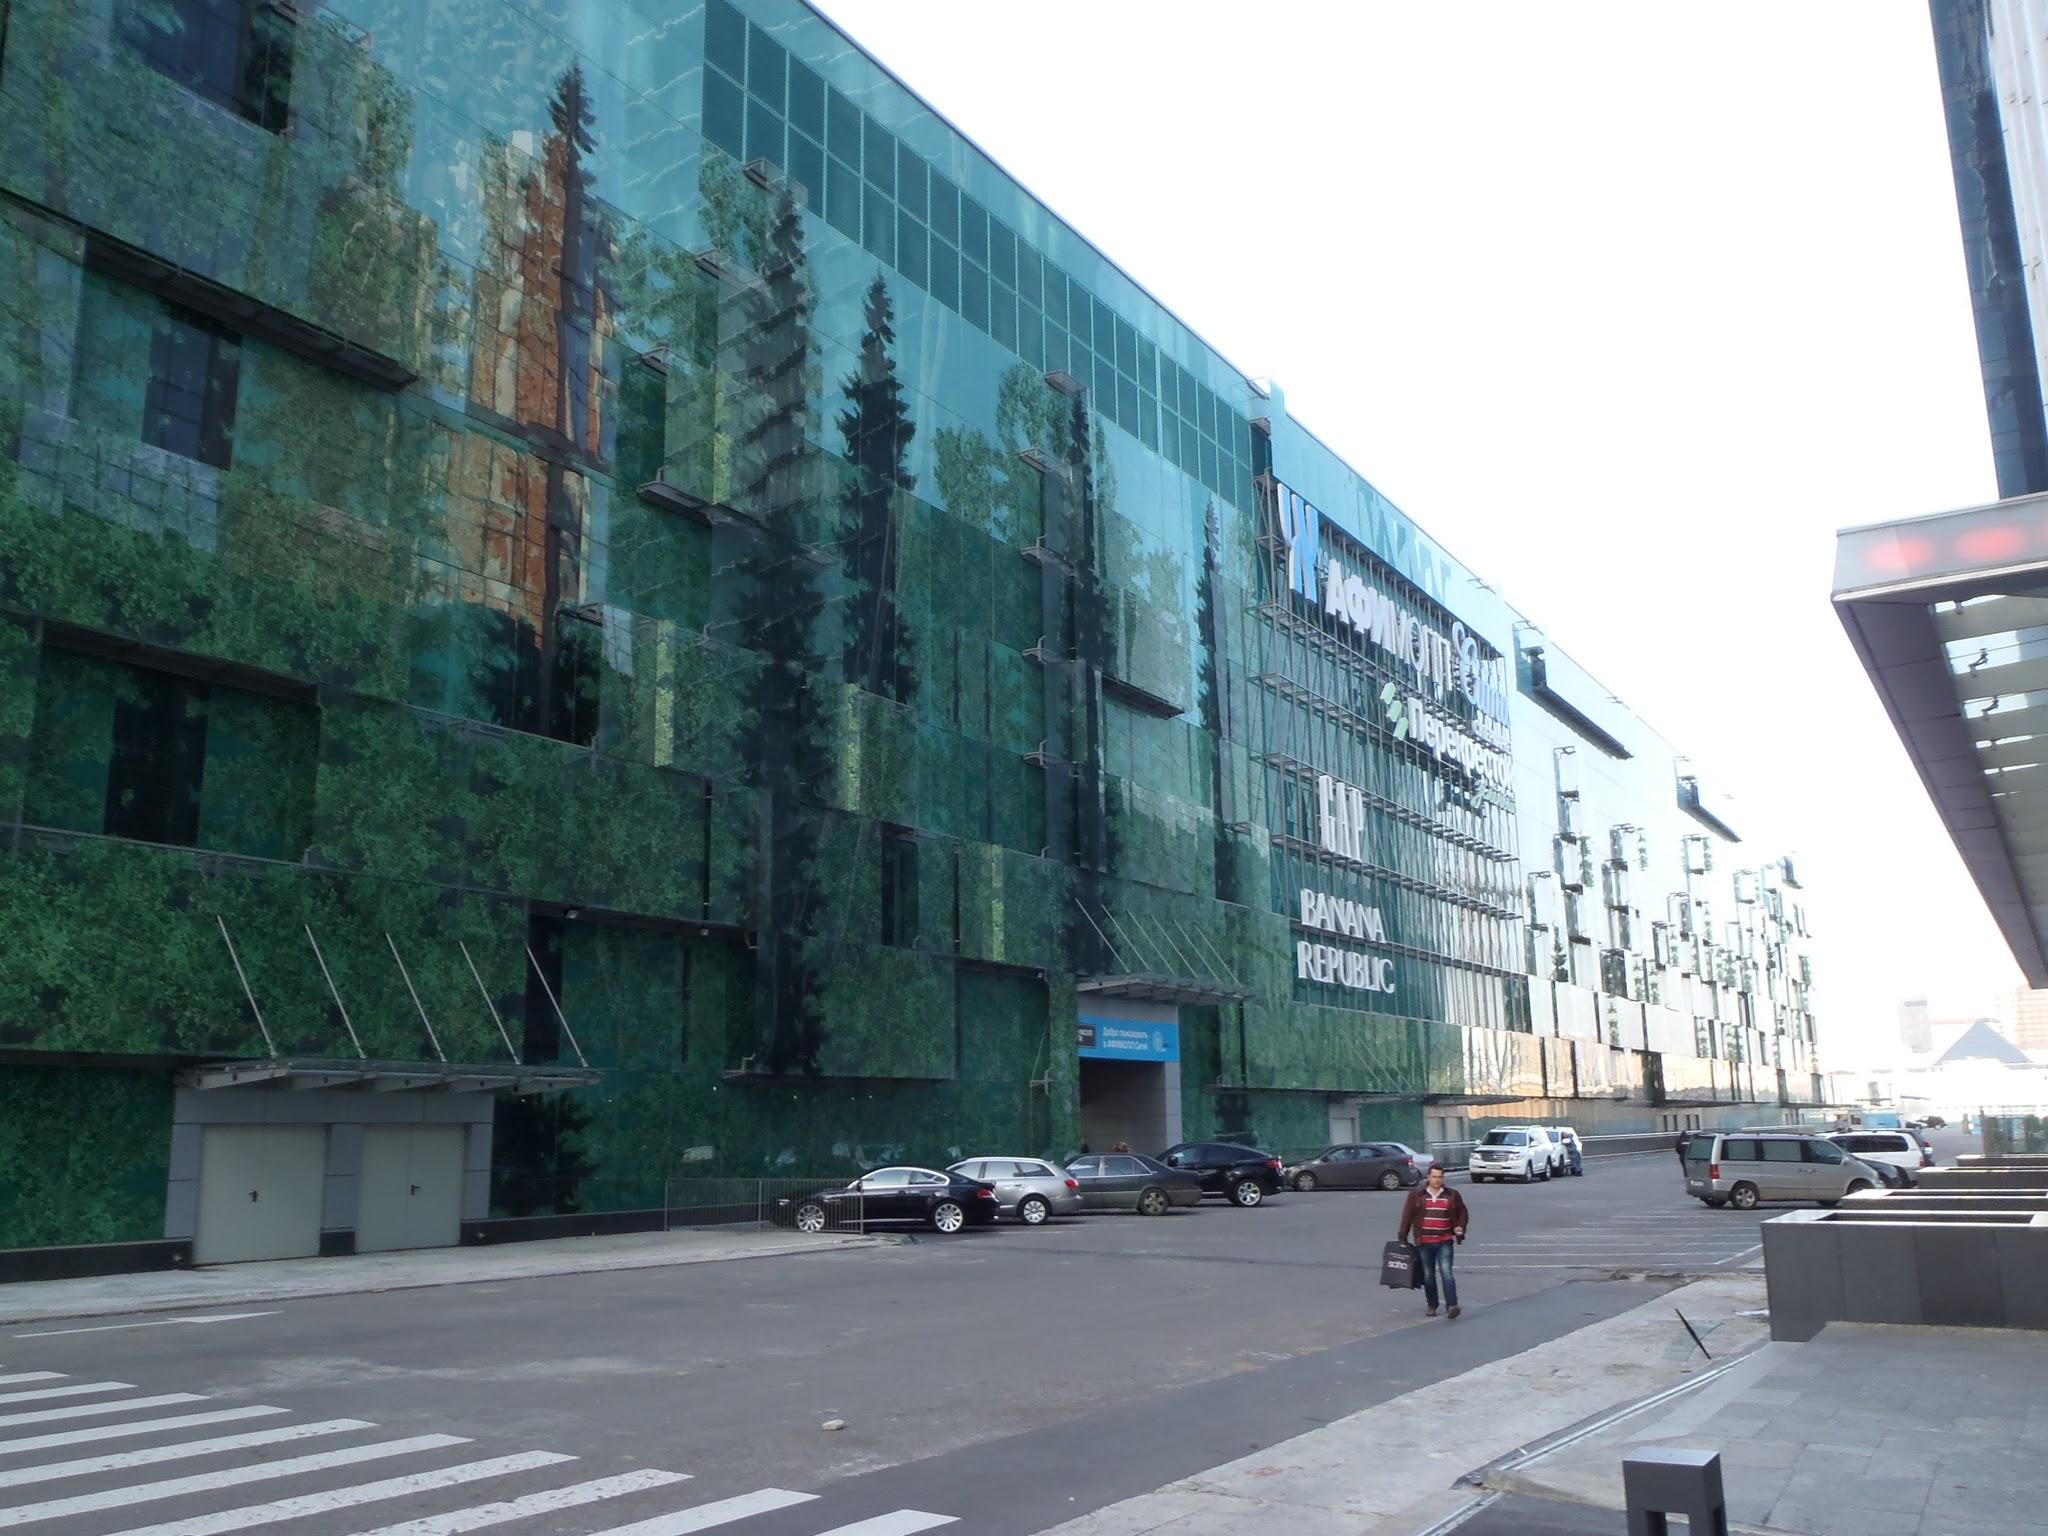 2a92e4772077 Афимолл Сити   AFIMALL – Москва, ТРЦ   Торговые центры (ТЦ, ТРЦ ...